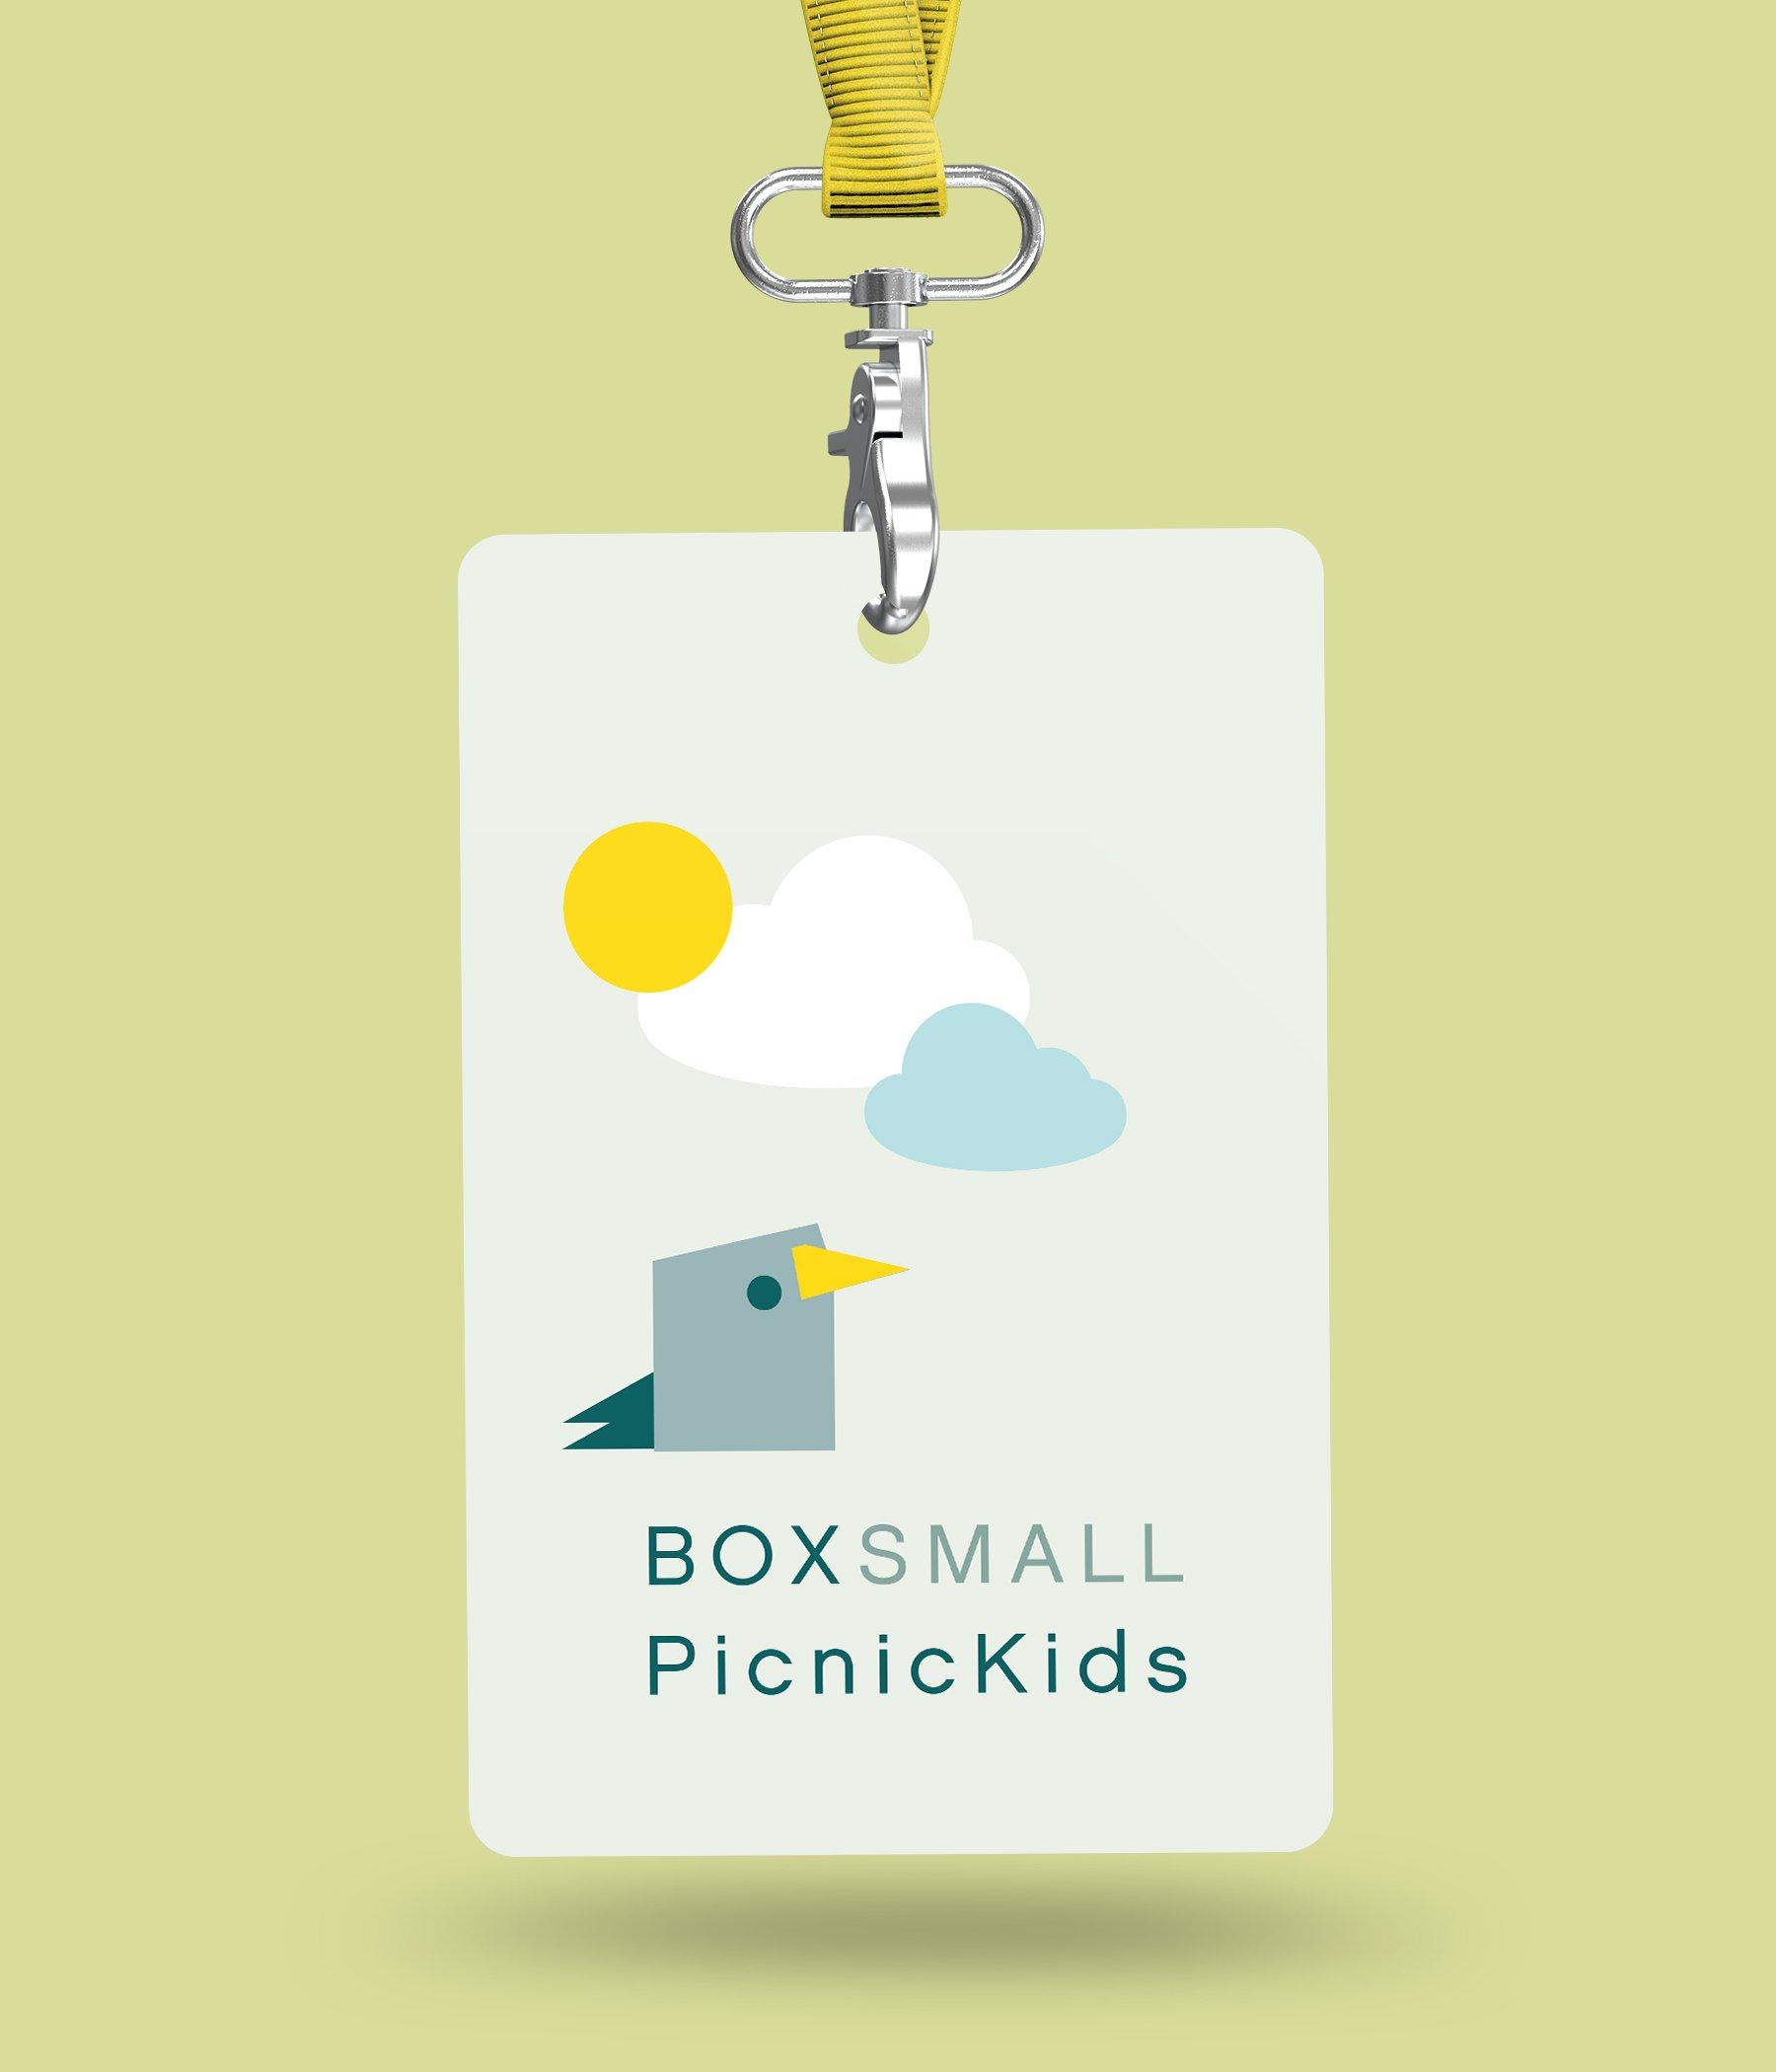 BoxSmall neck tags for 'Picnic Kids'